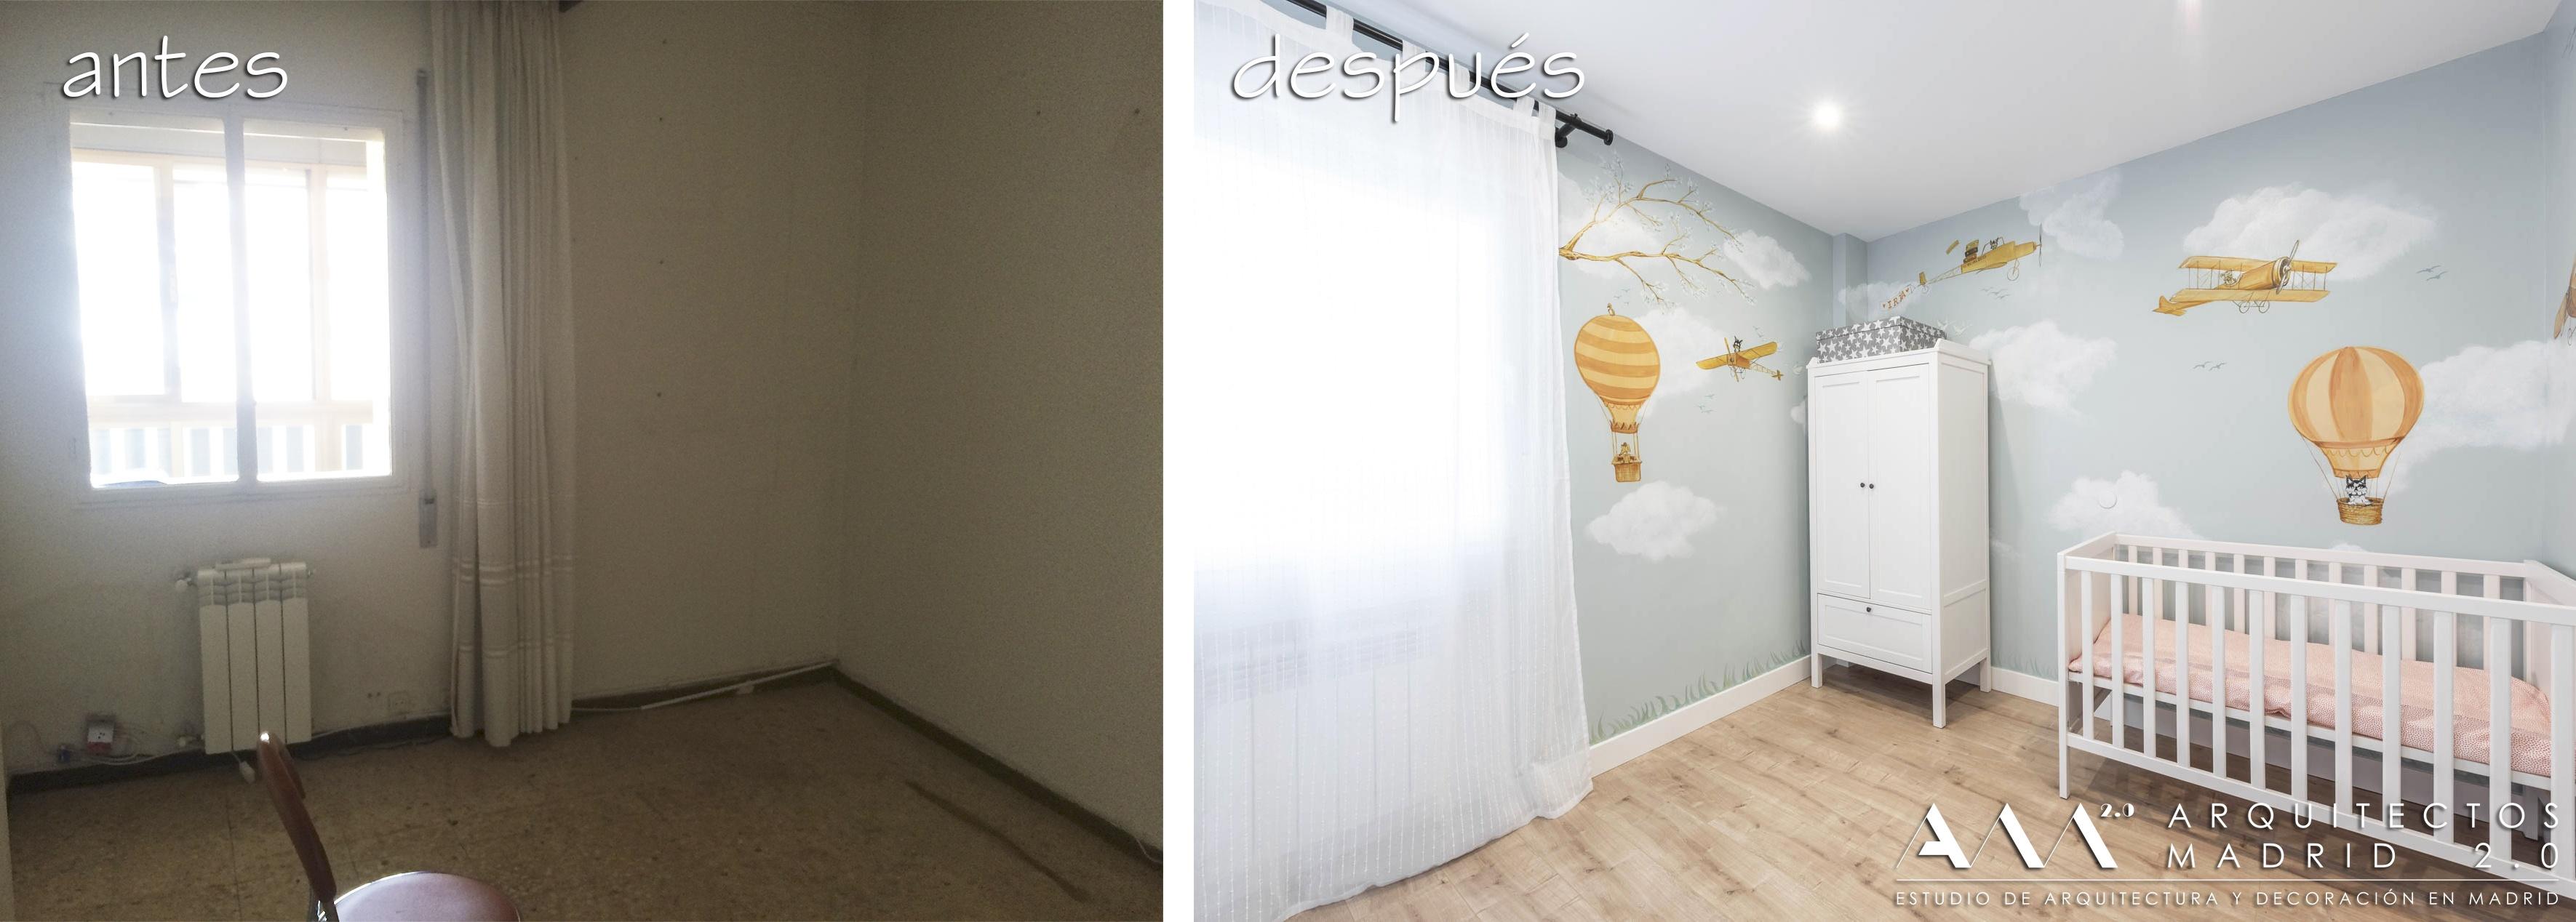 antes-despues-reforma-vivienda-housing-reform-architects-design-childs-bedroom